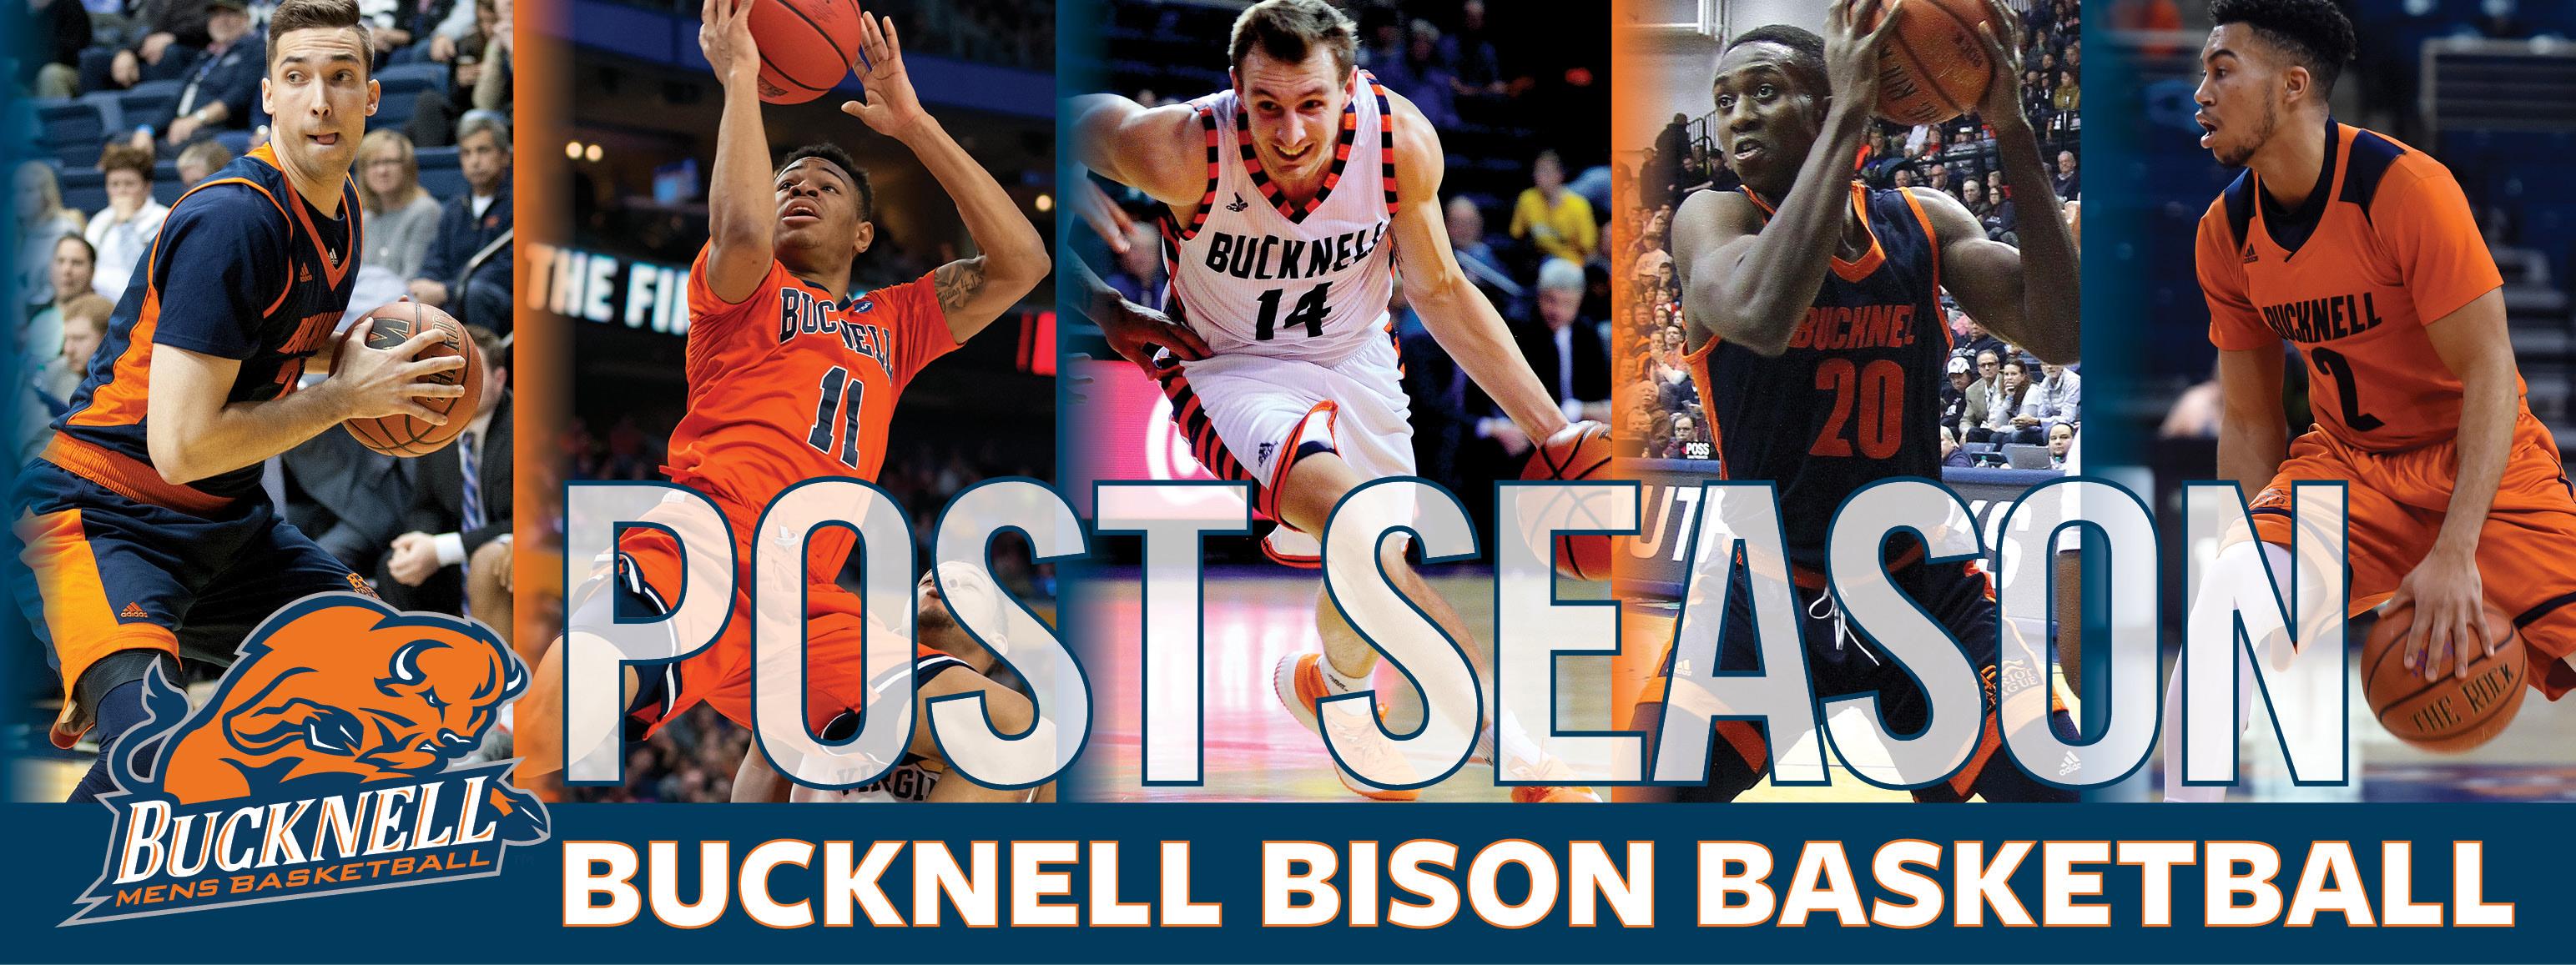 NCAA Tournament-Bucknell Men's Basketball Pre-Game Reception-Bucknell vs. Michigan State 3/16/2018